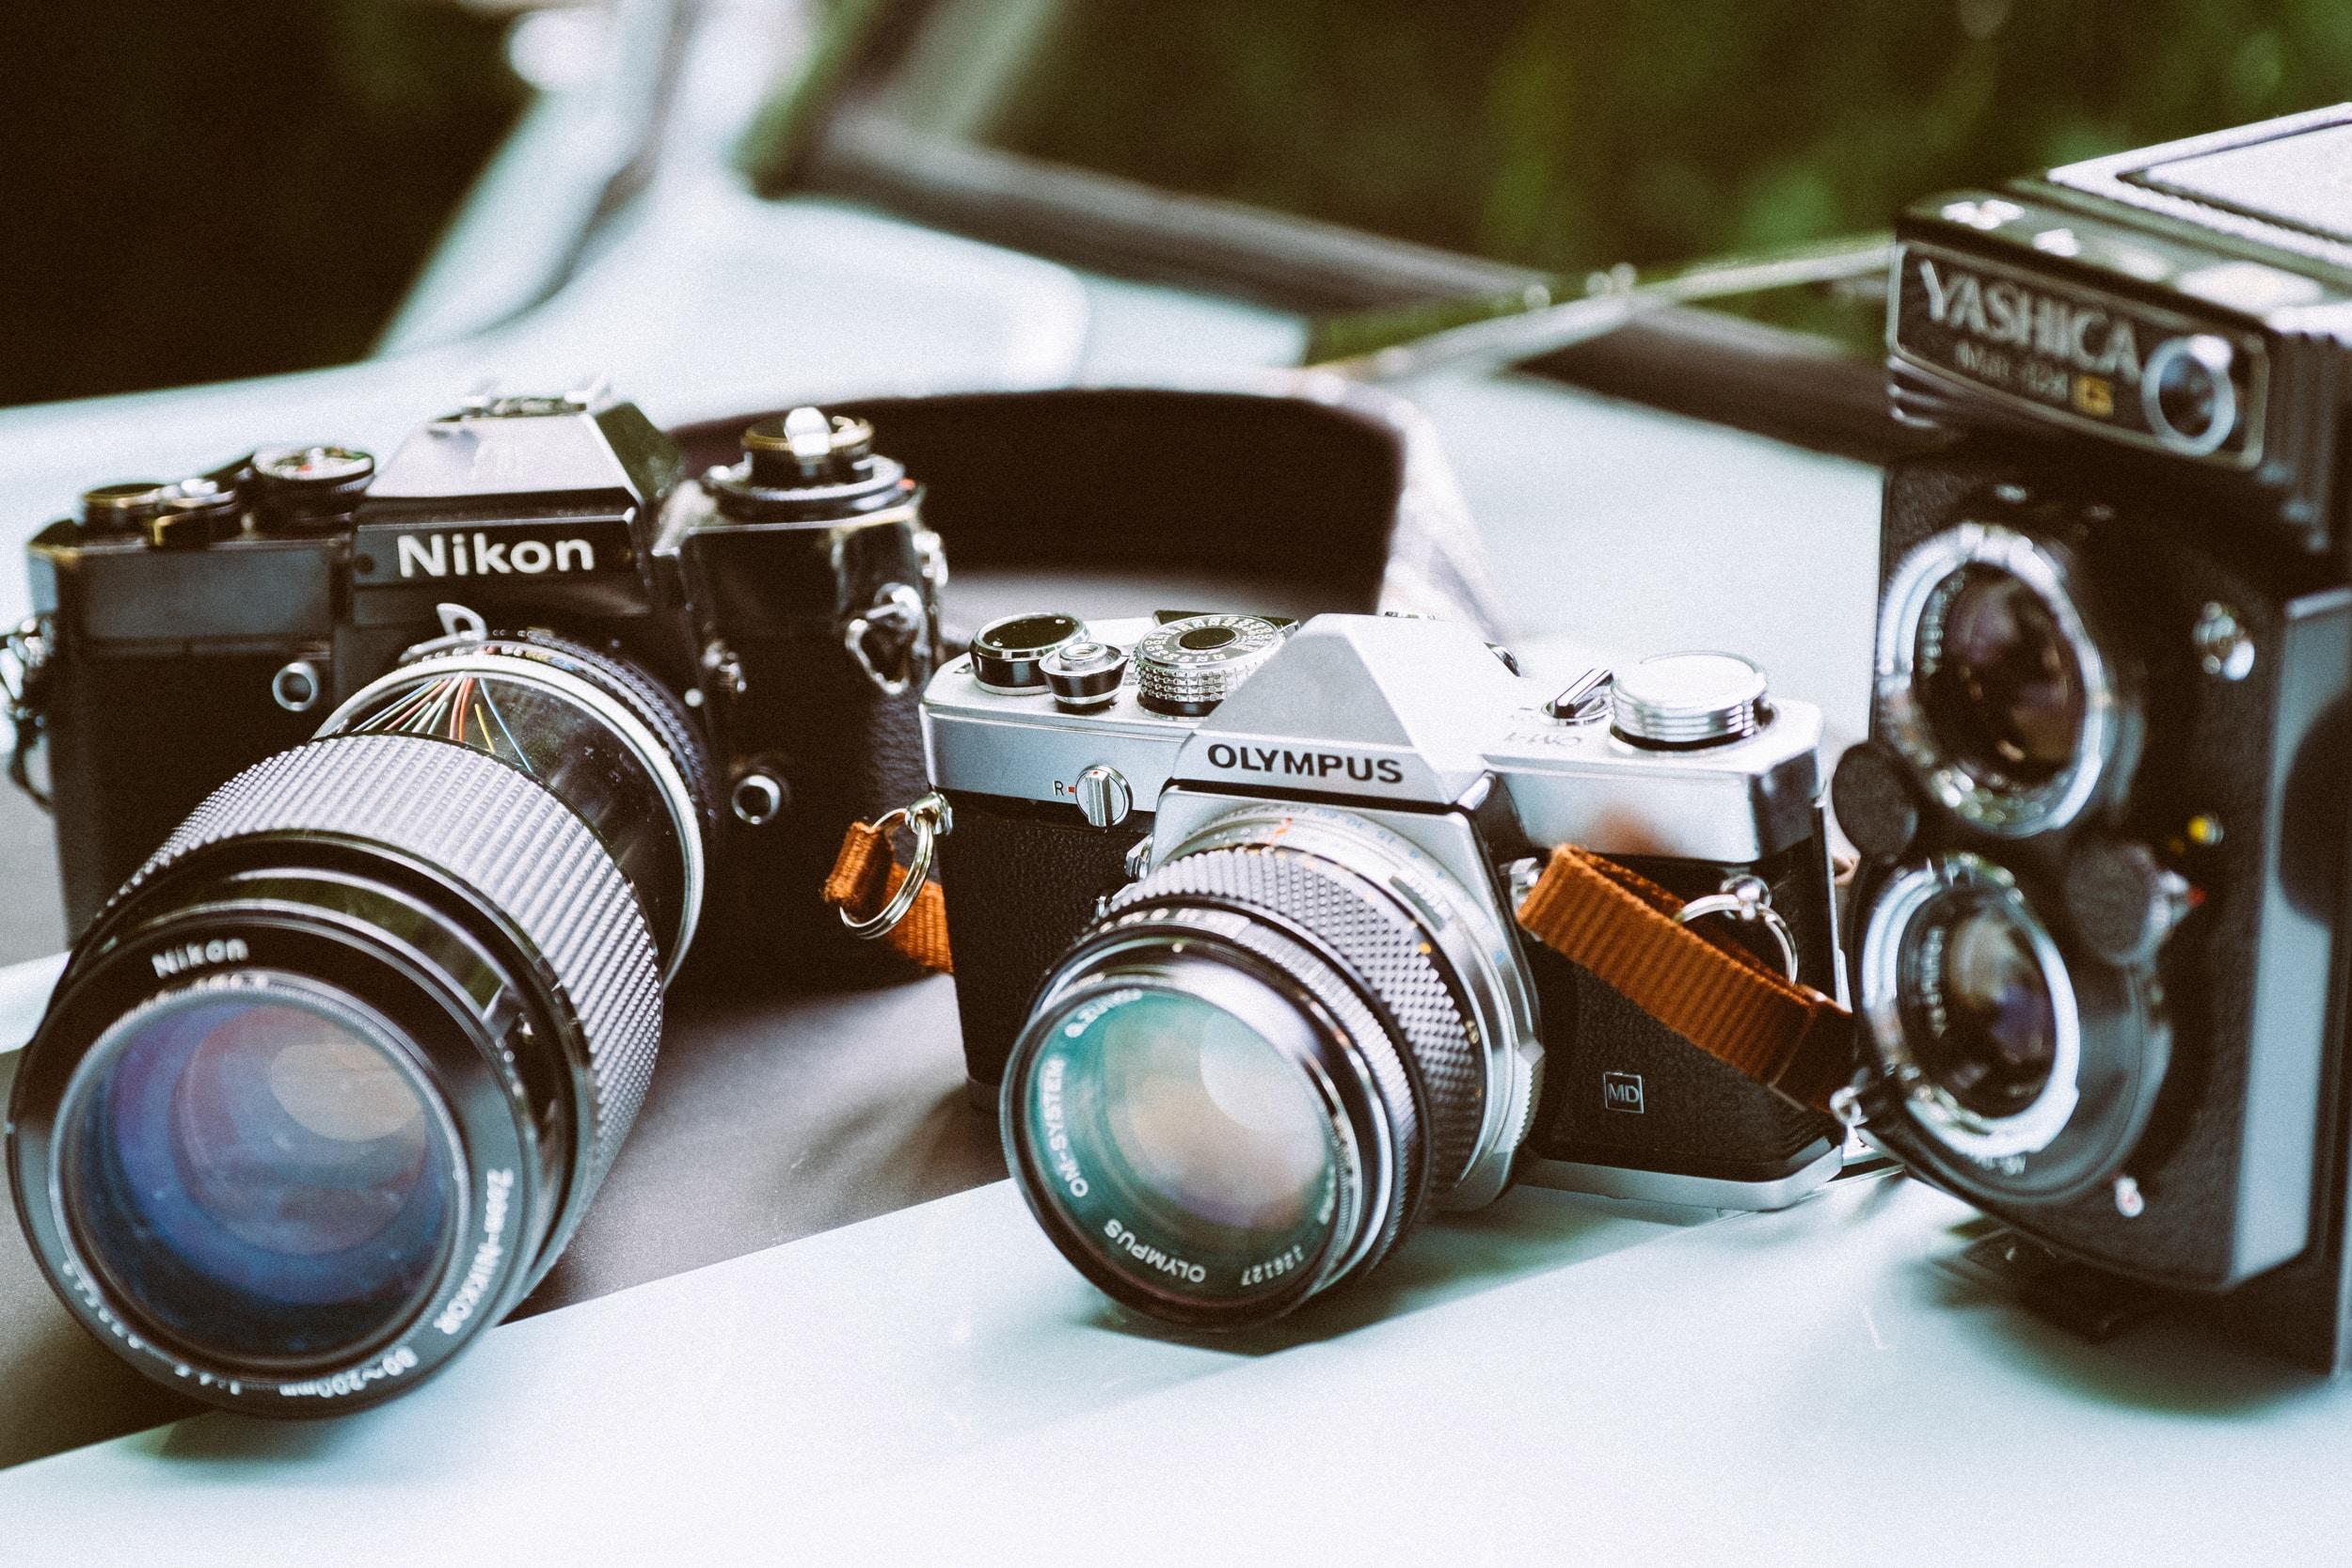 shallow focus photo of gray Olympus camera